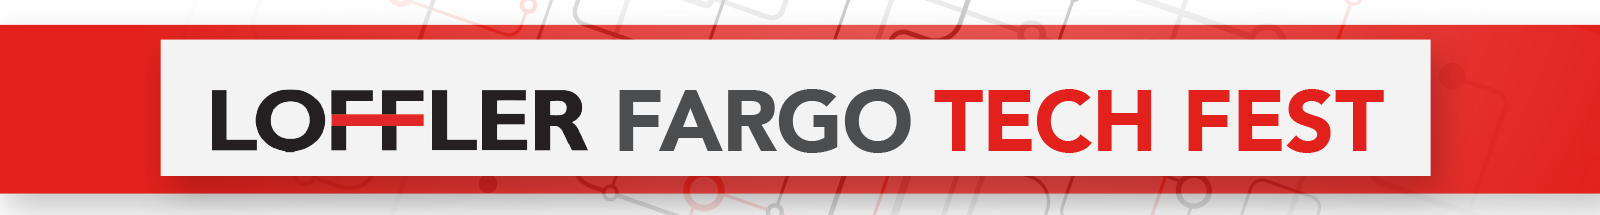 Fargo Tech Fest home page ad